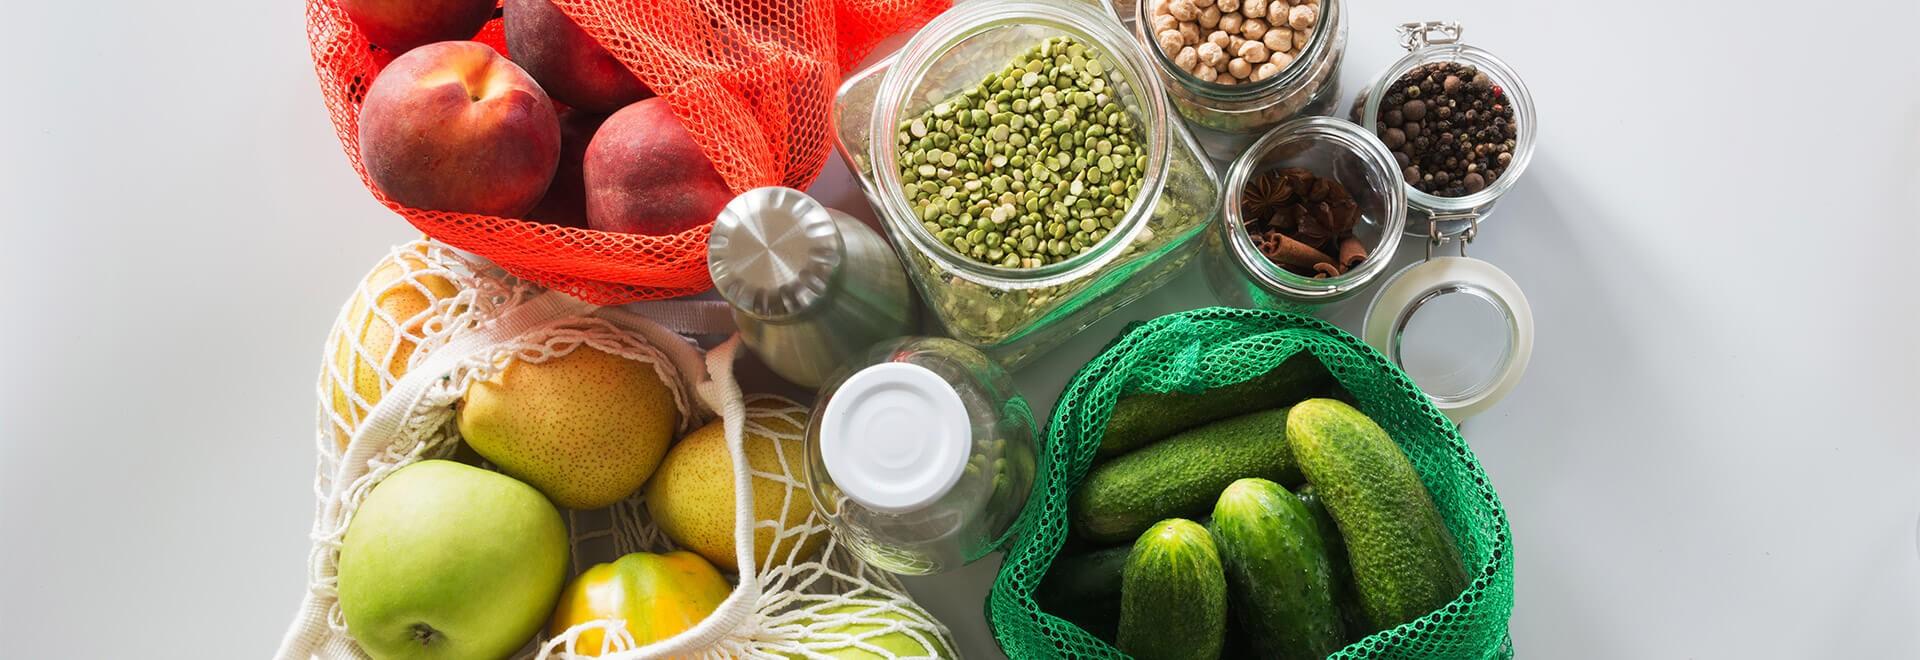 Environnement et alimentation : initiatives vertes à adopter